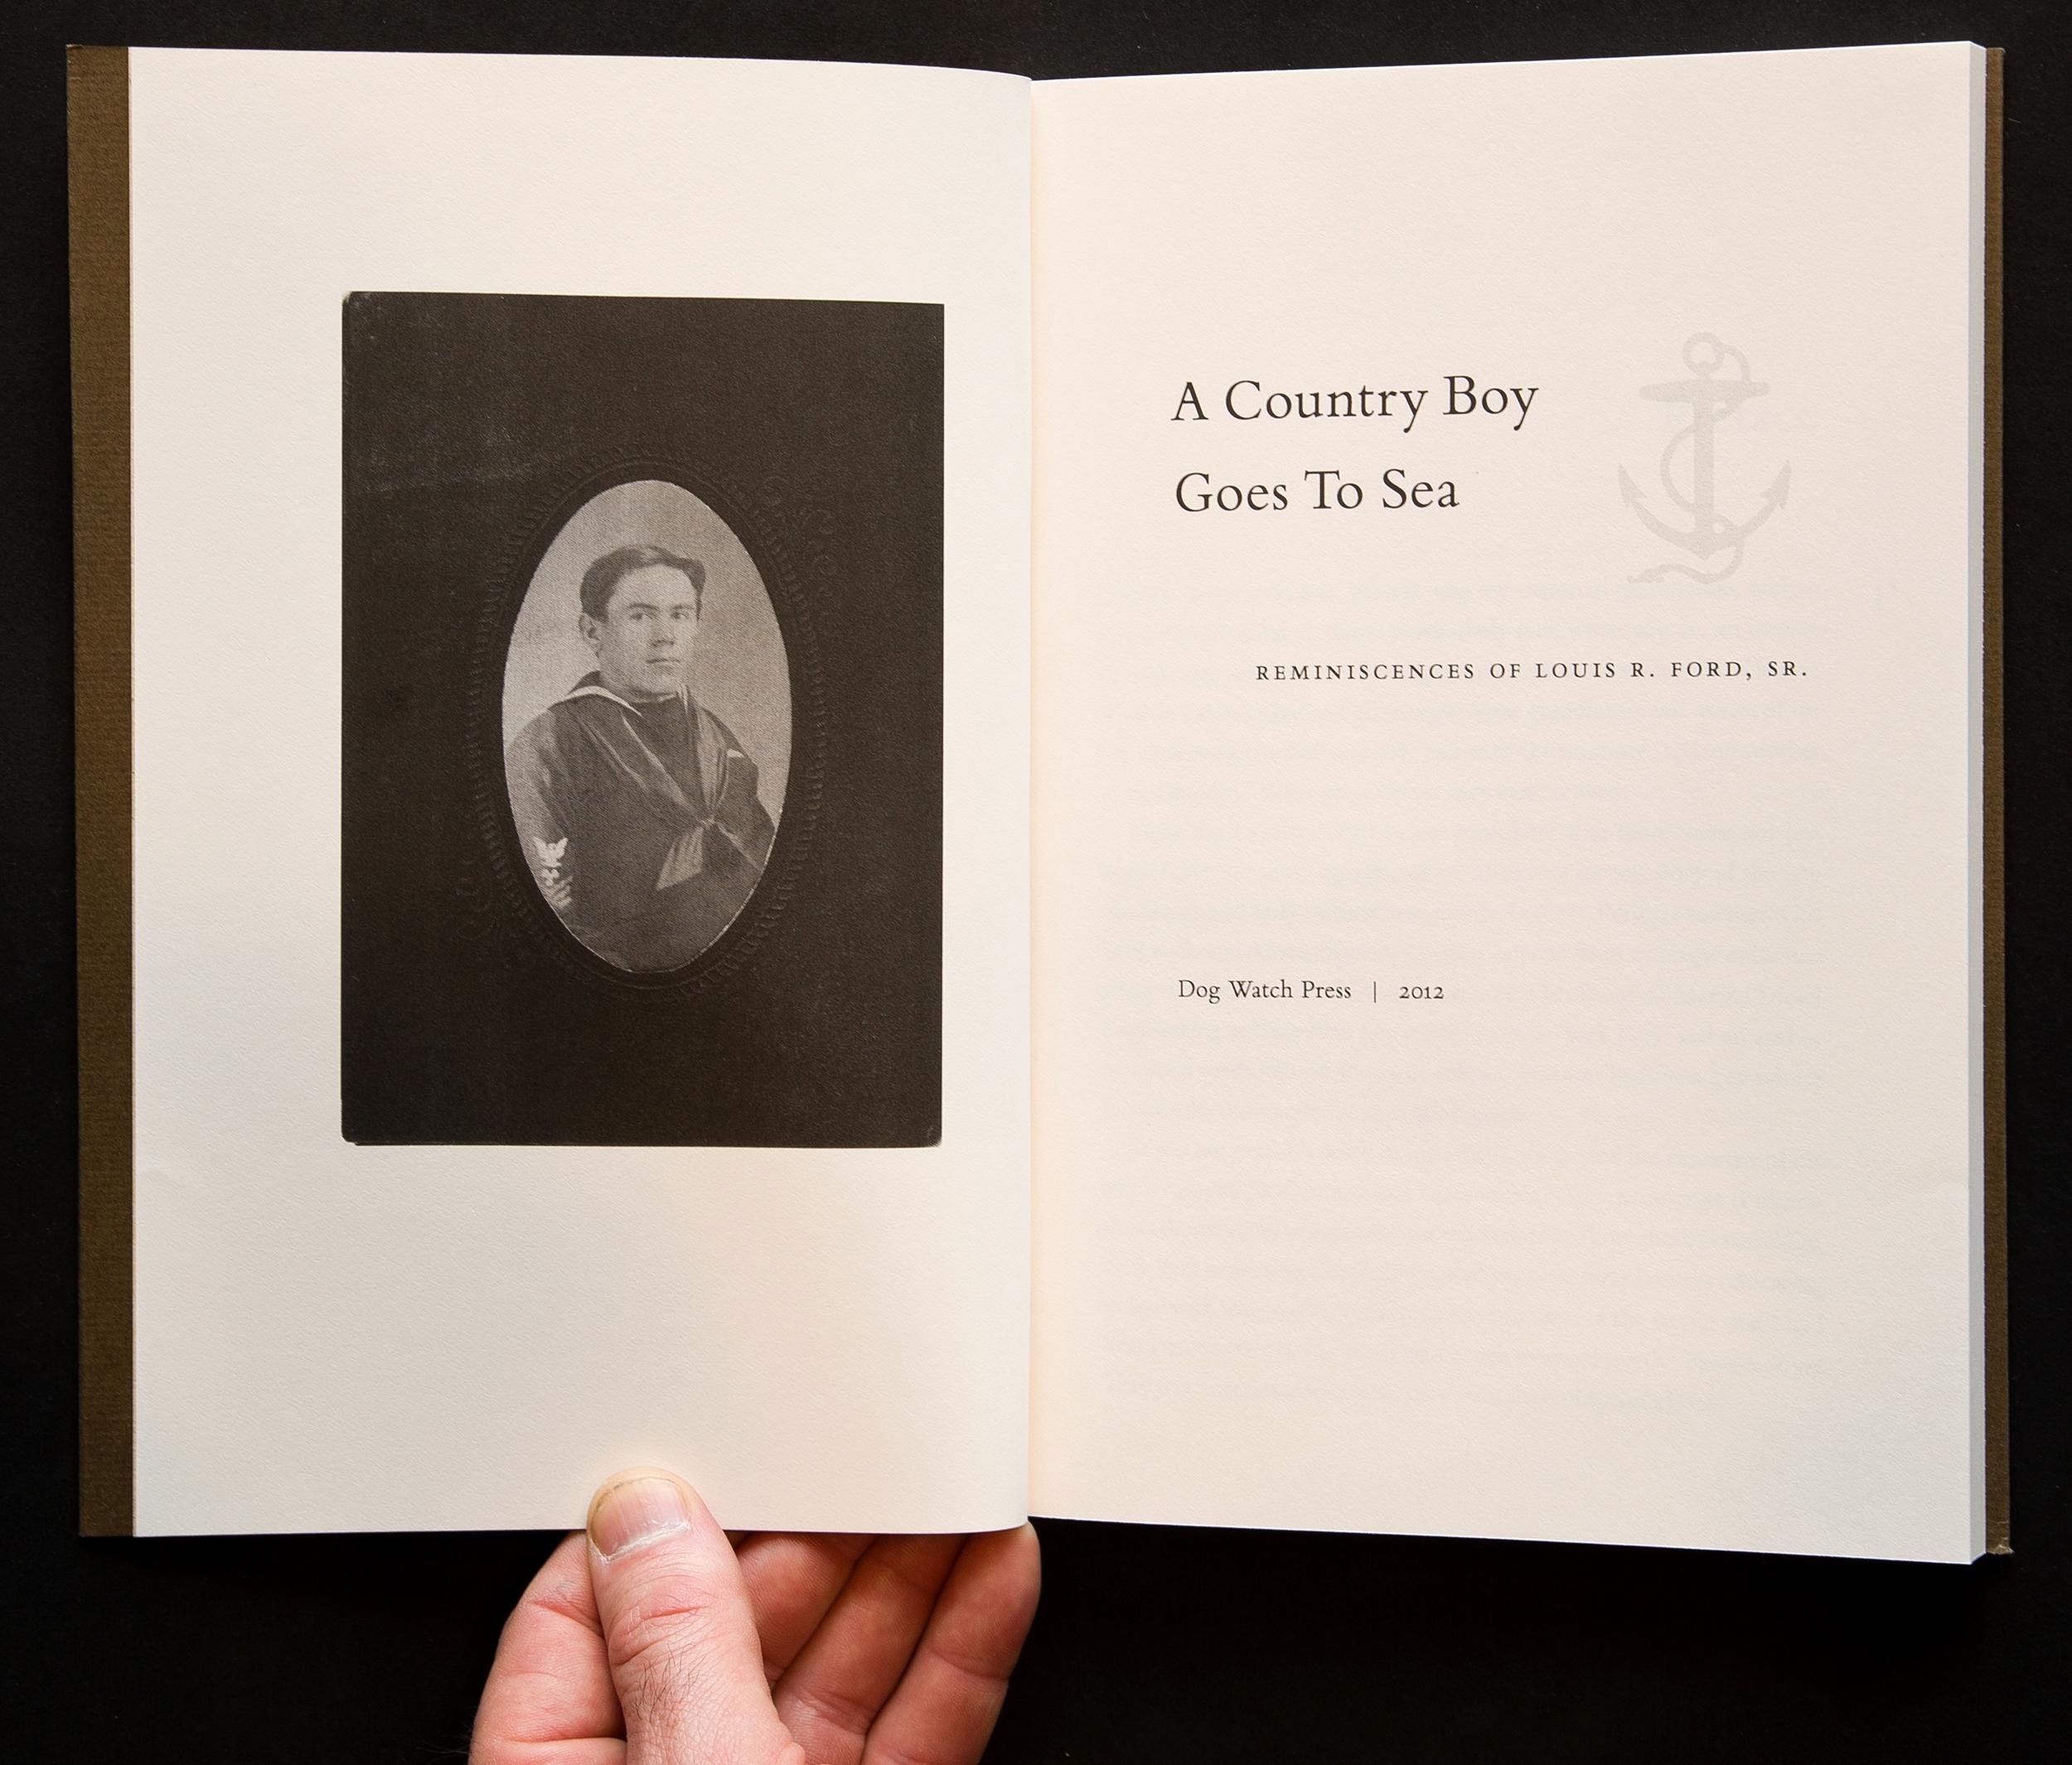 Countryboy.titlespread.jpg